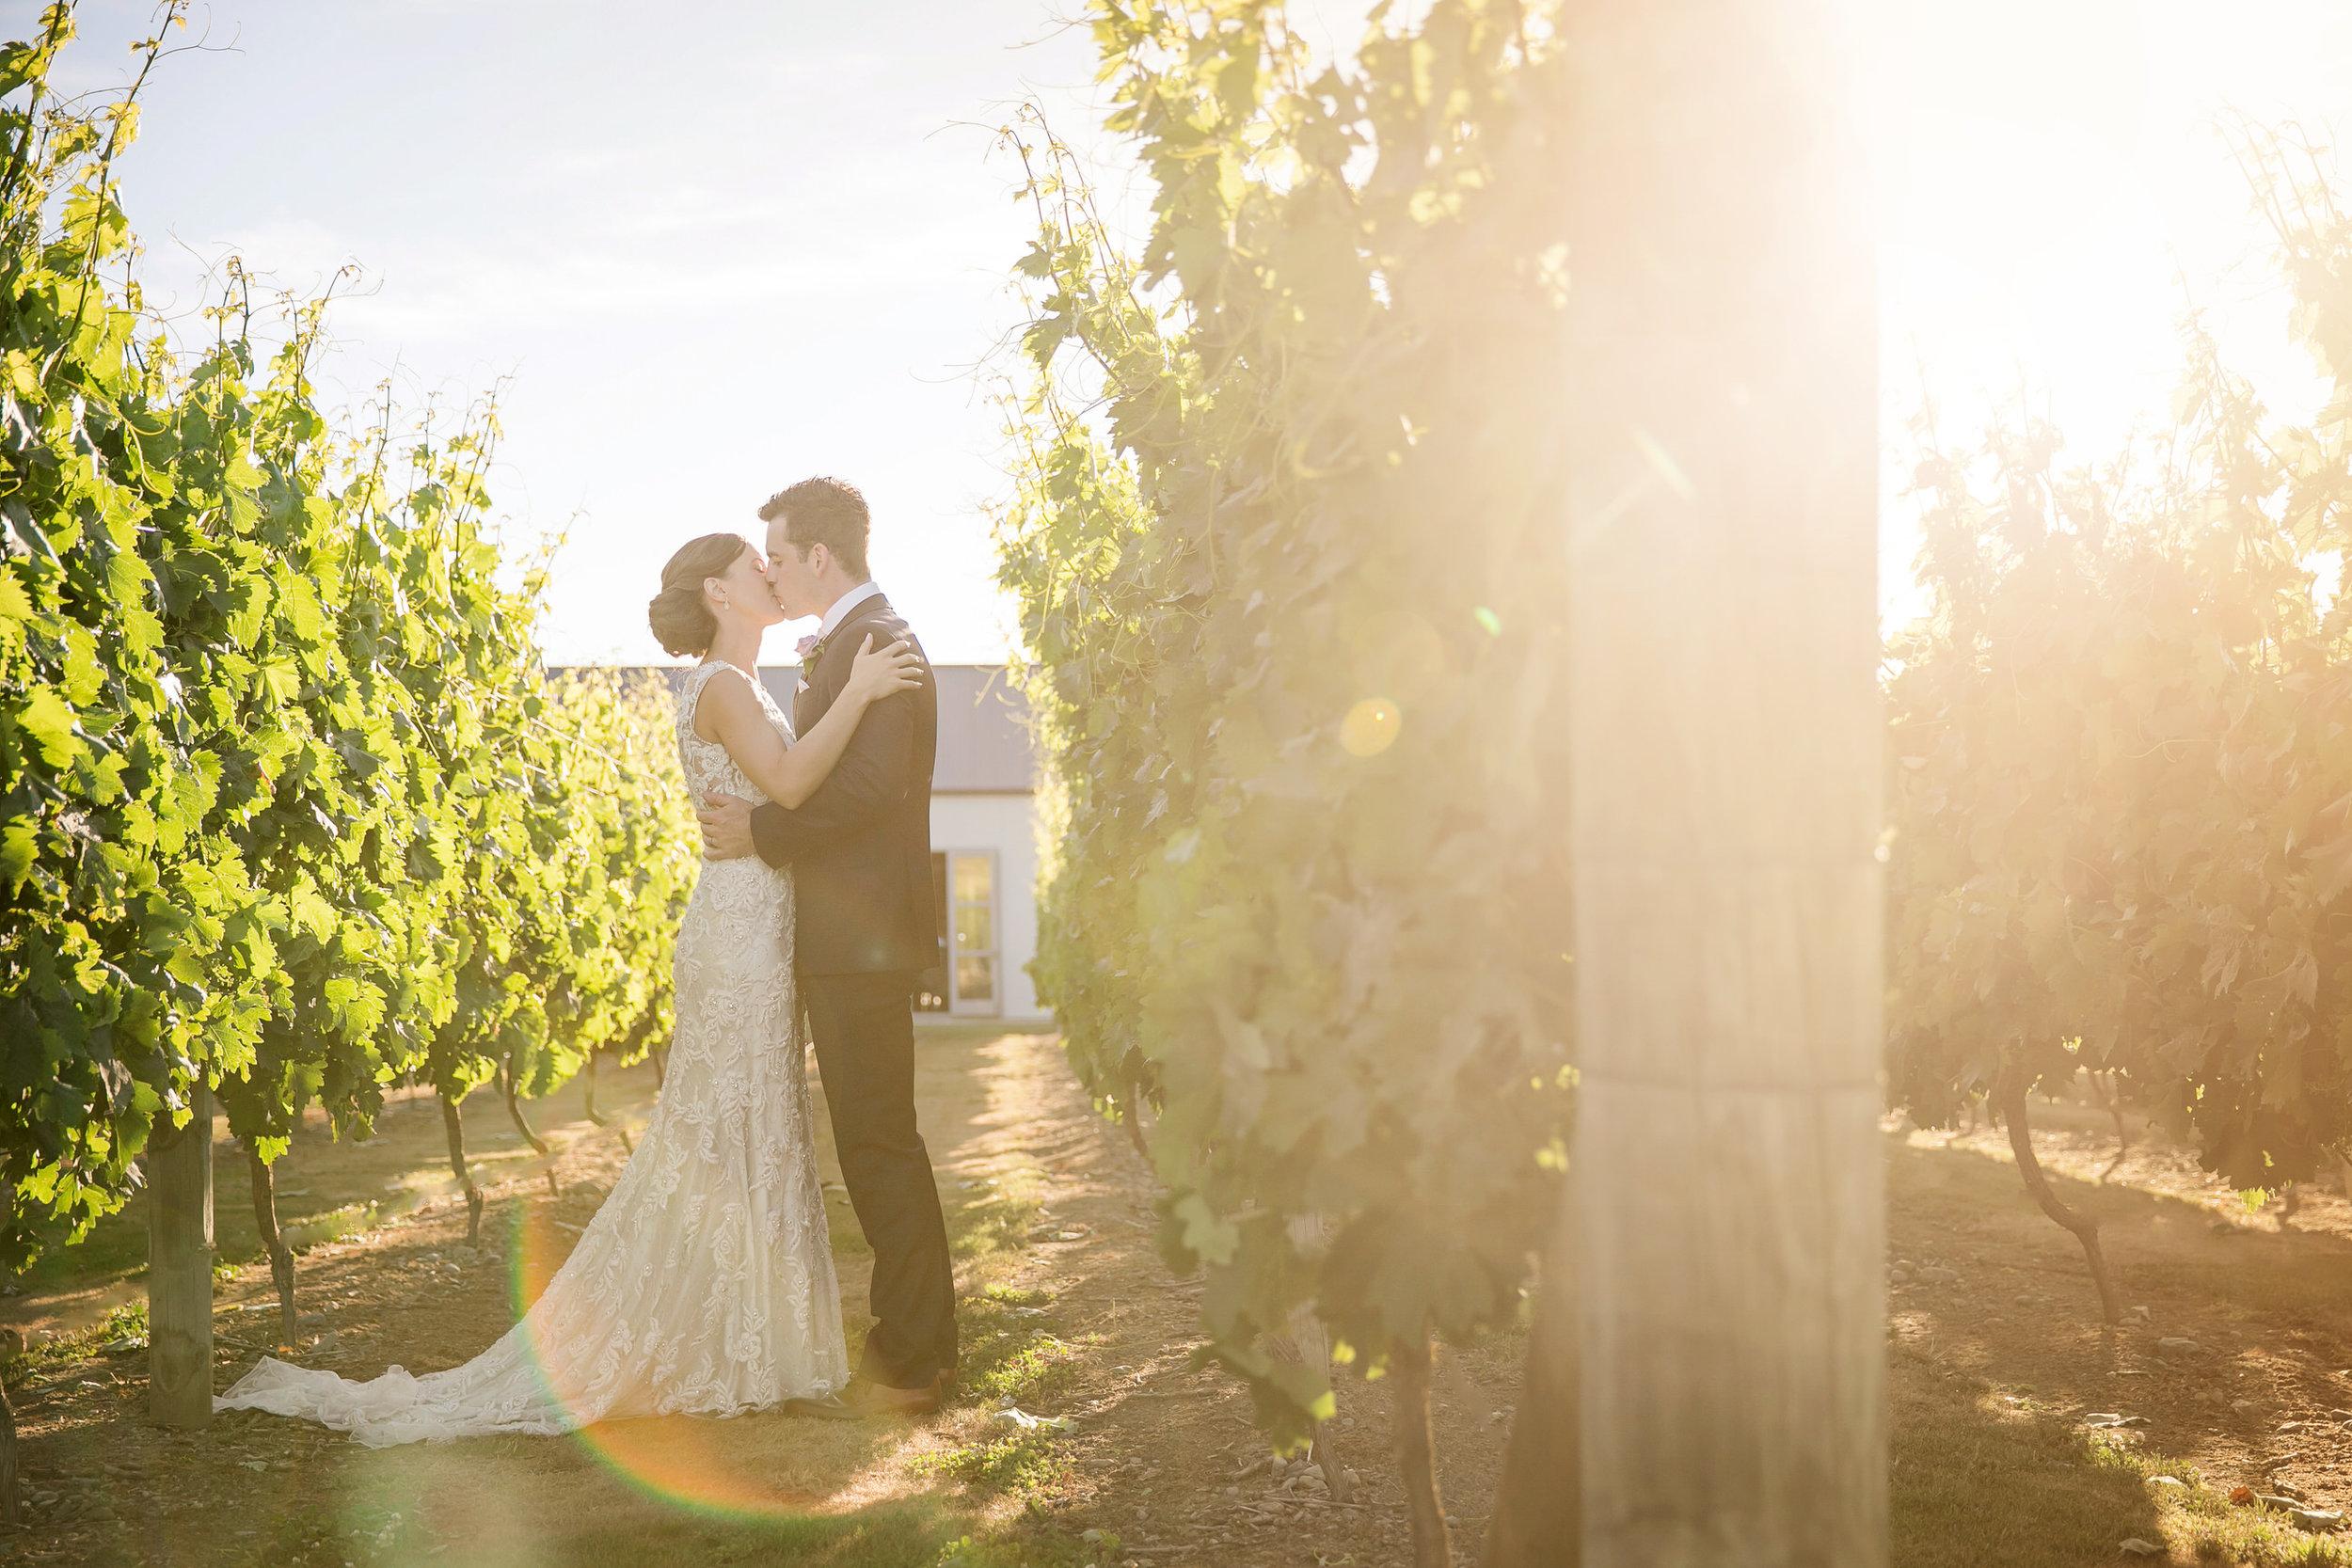 Martinborough-Poppies-Wedding-Caine-Eloise-Toni-Larsen-0110.jpg